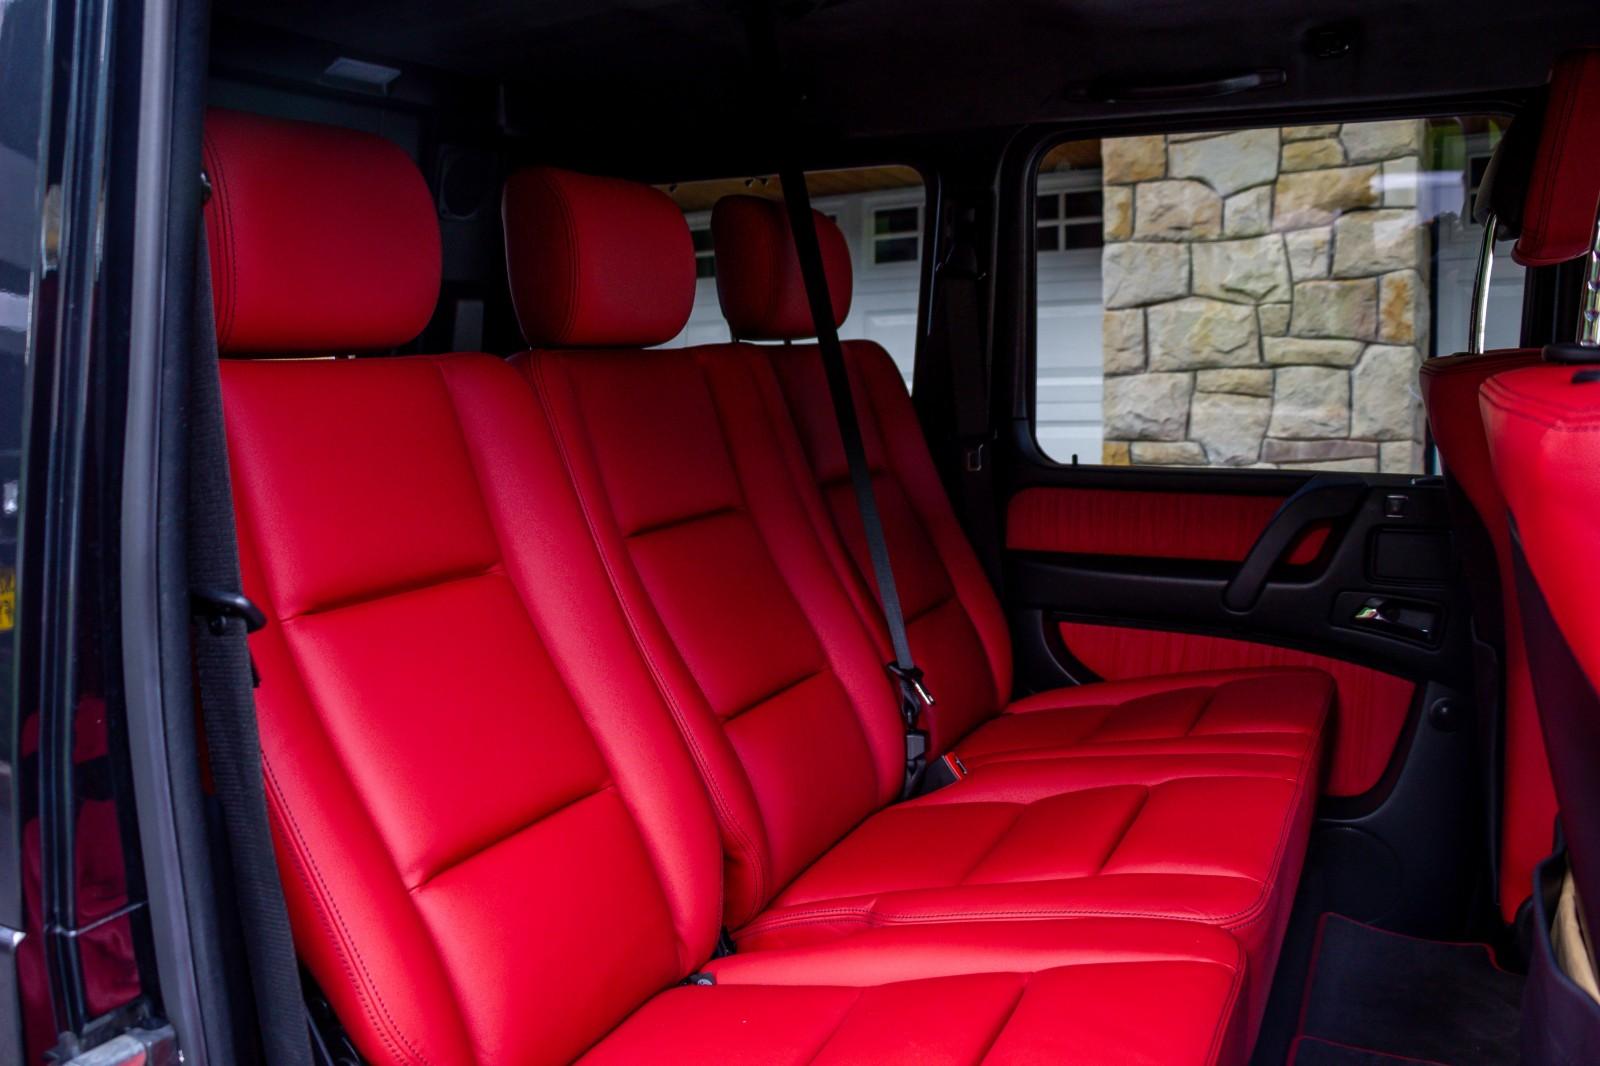 2013 Mercedes-Benz G Class G63 AMG 5.5 BI-TURBO Petrol Automatic – Morgan Cars 9 Mound Road, Warrenpoint, Newry BT34 3LW, UK full